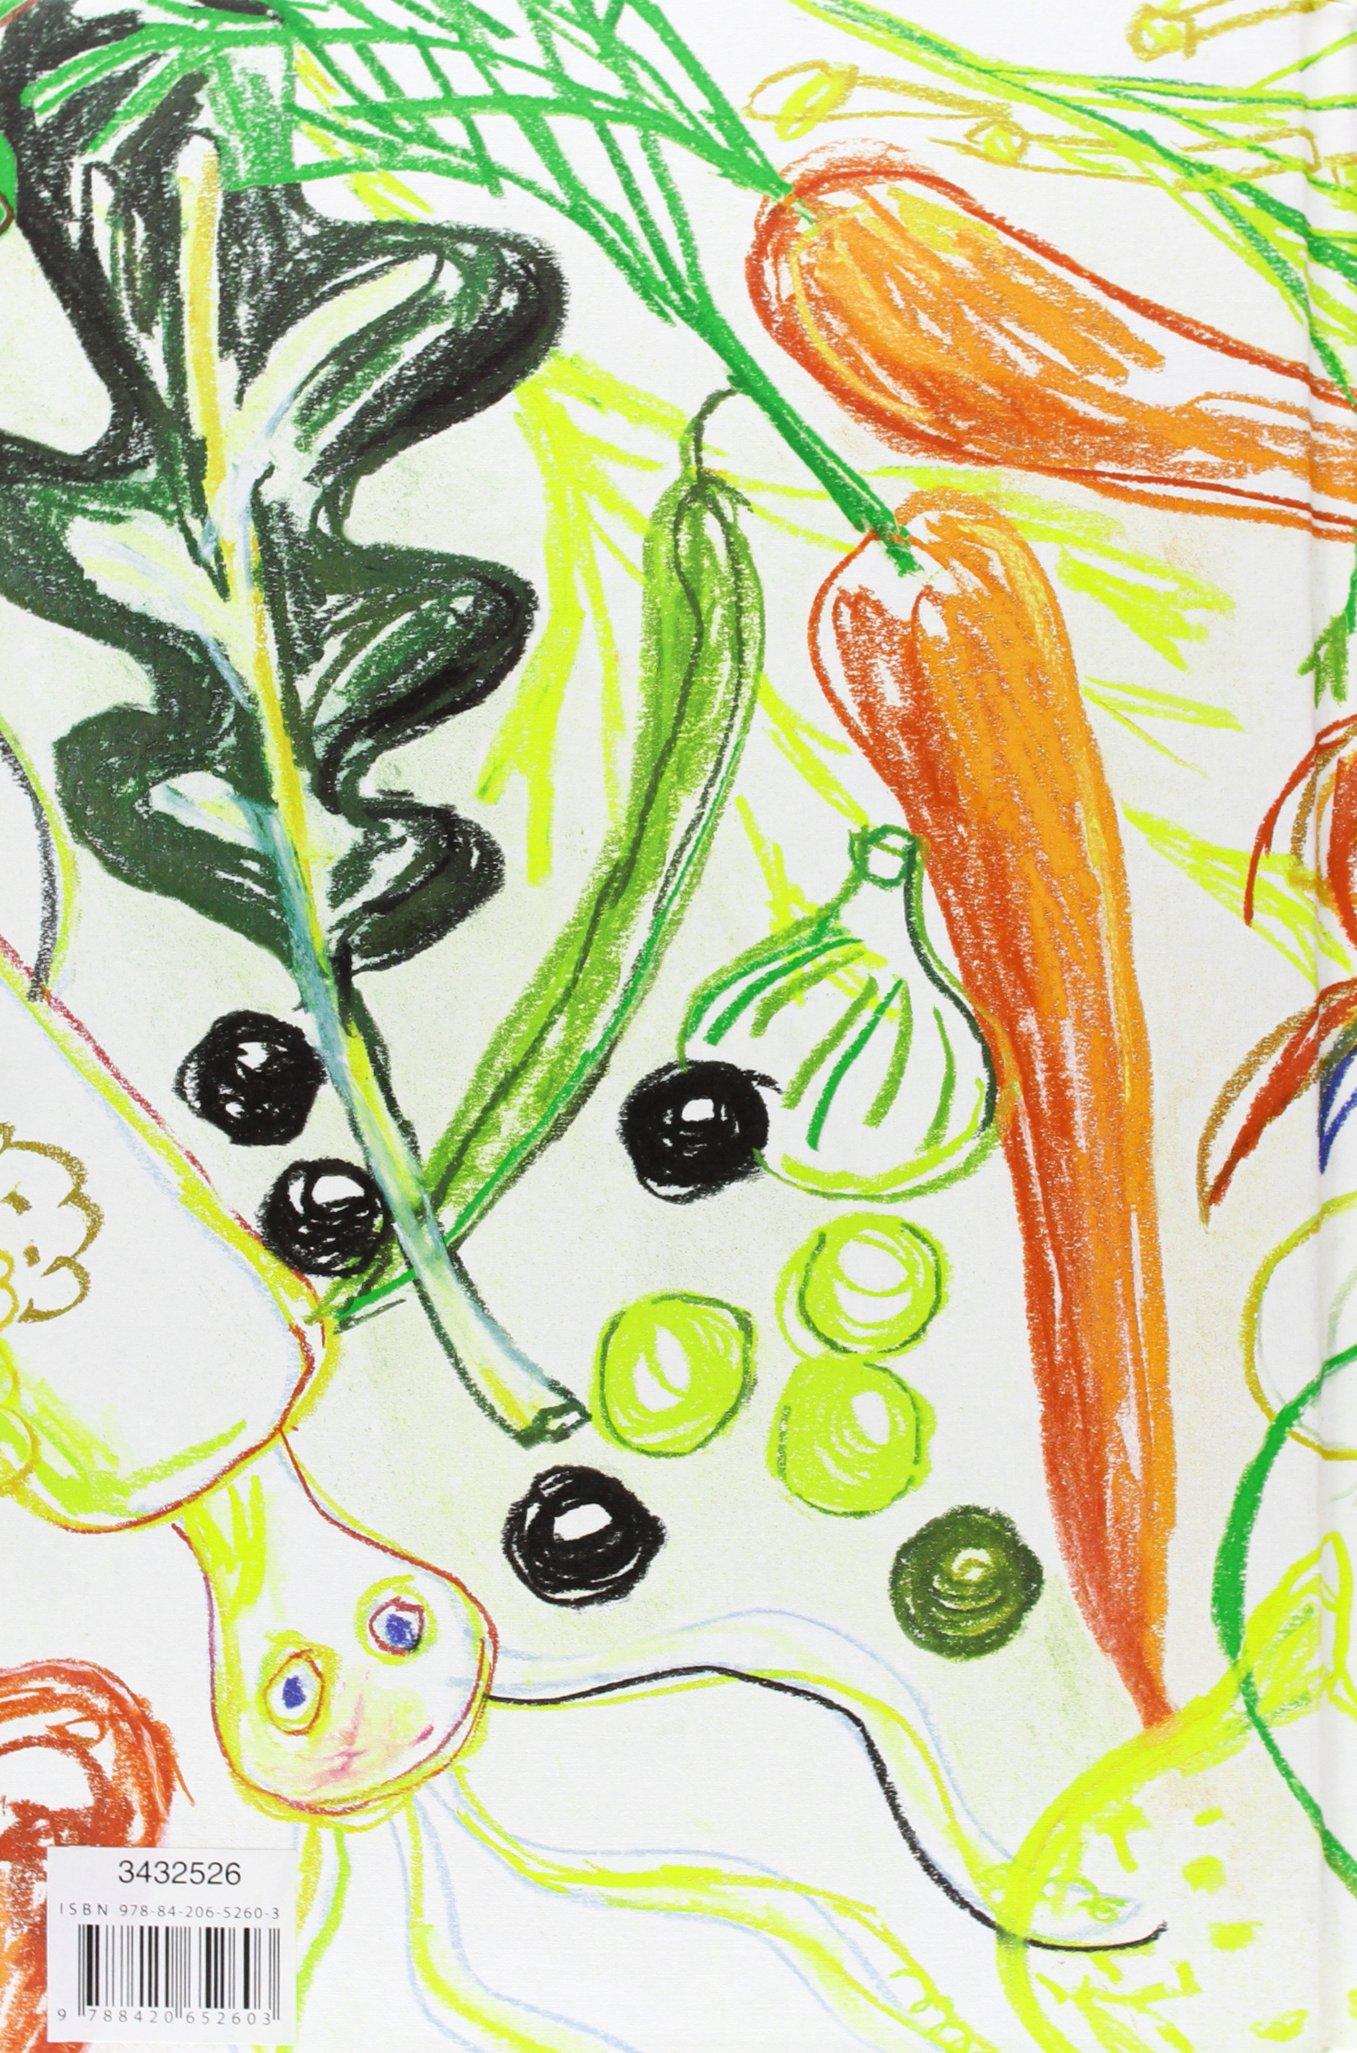 1080 recetas de cocina / 1080 Cooking Recipes (Spanish Edition): Simone  Ortega, Javier Mariscal: 9788420652603: Amazon.com: Books